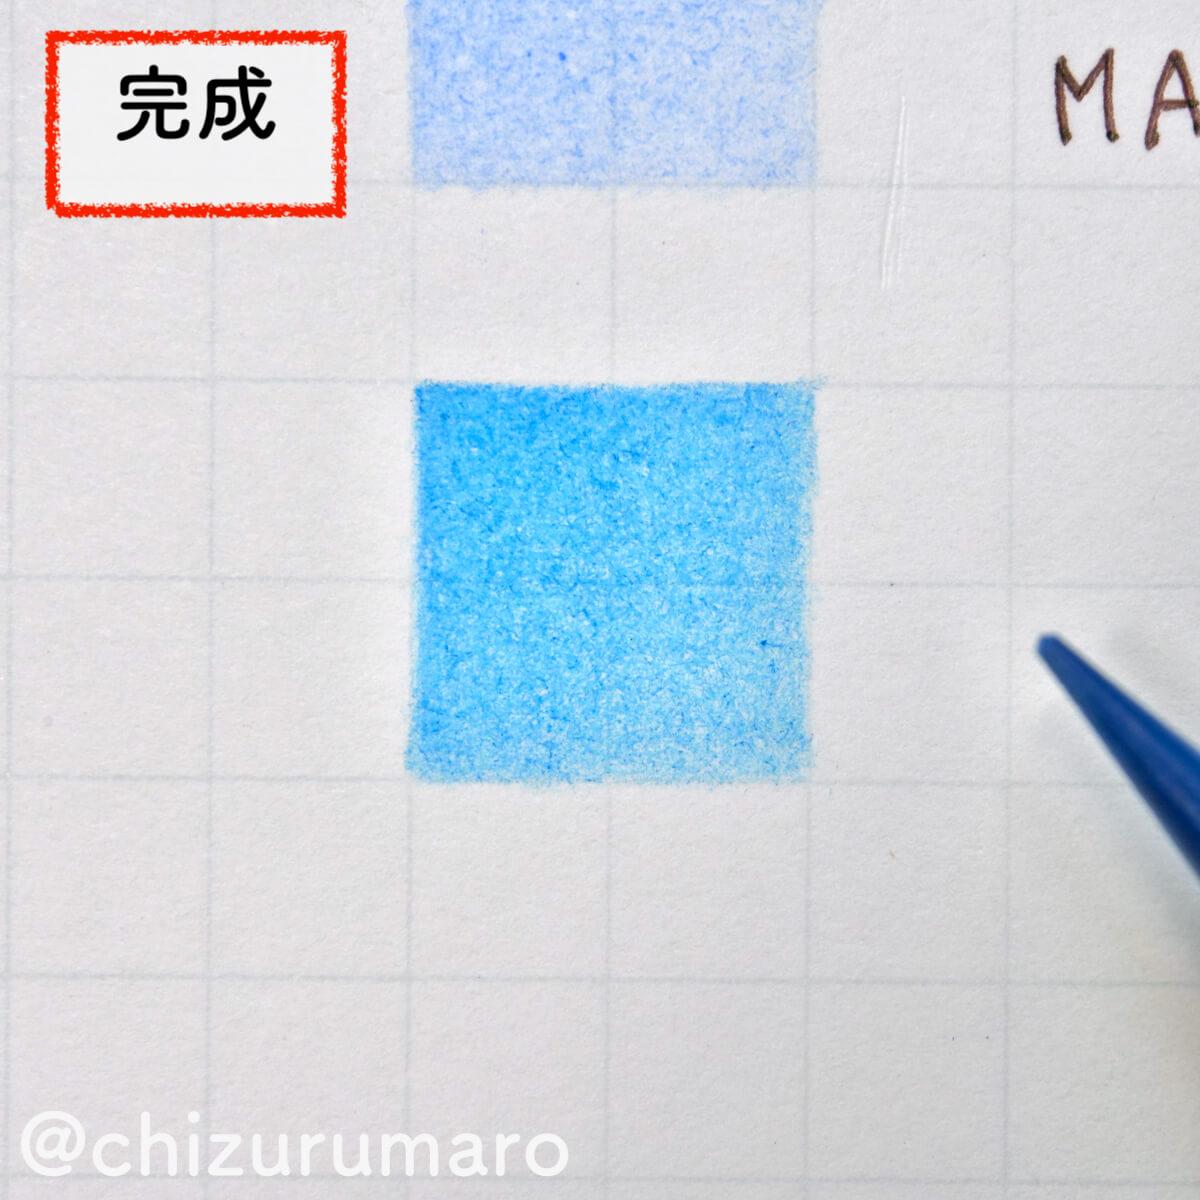 f:id:chizurumaro:20200921220242j:plain